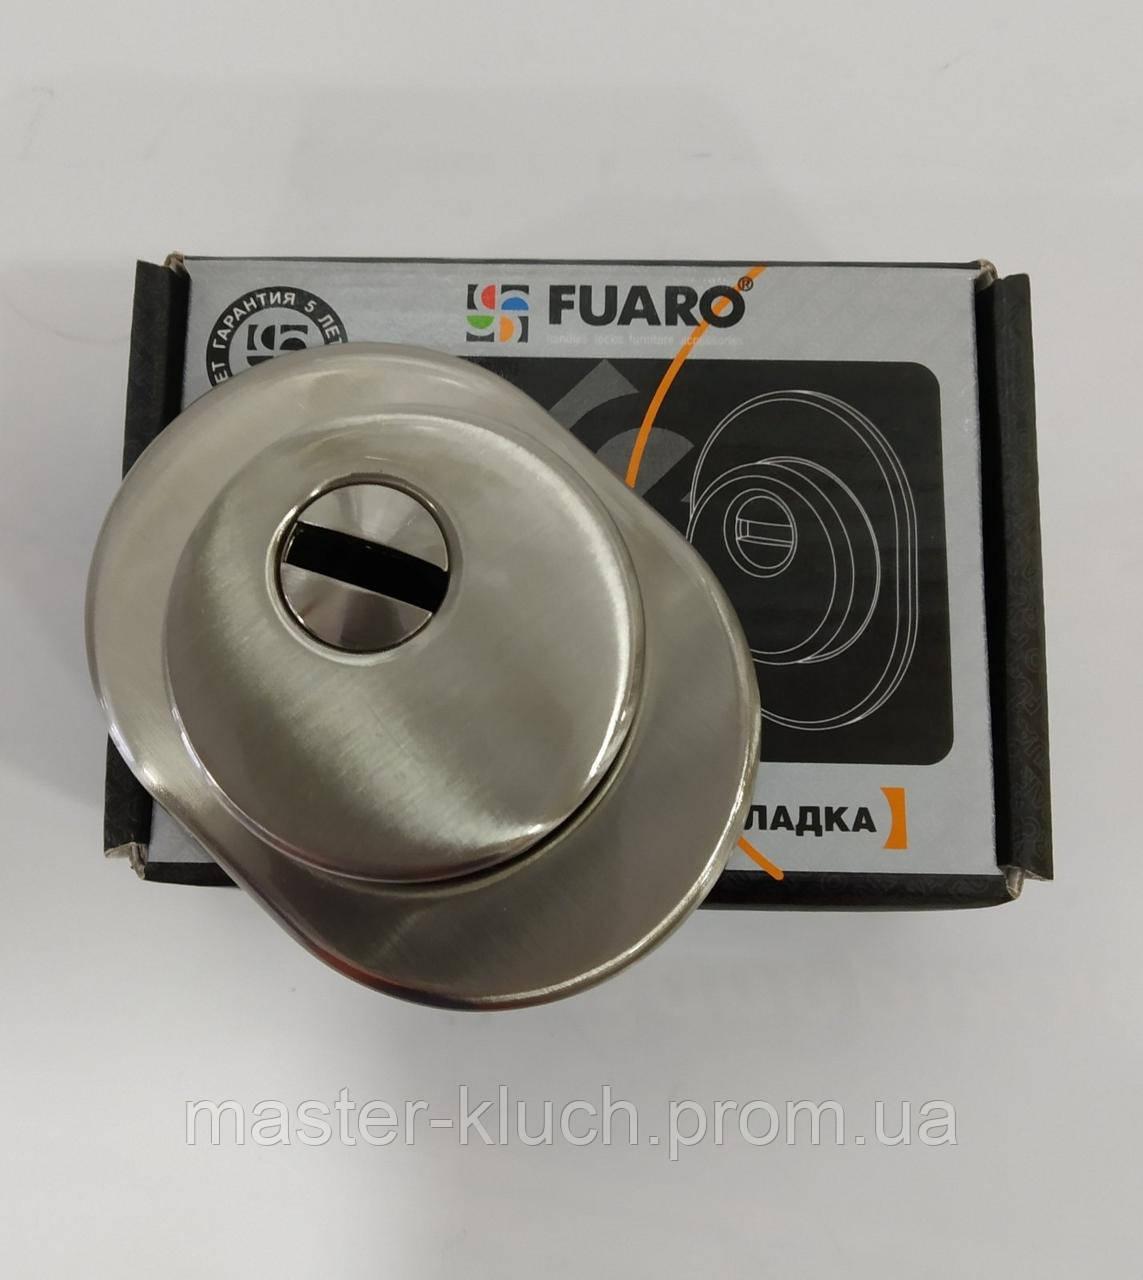 Броненакладка Fuaro DEF 4825 SN никель